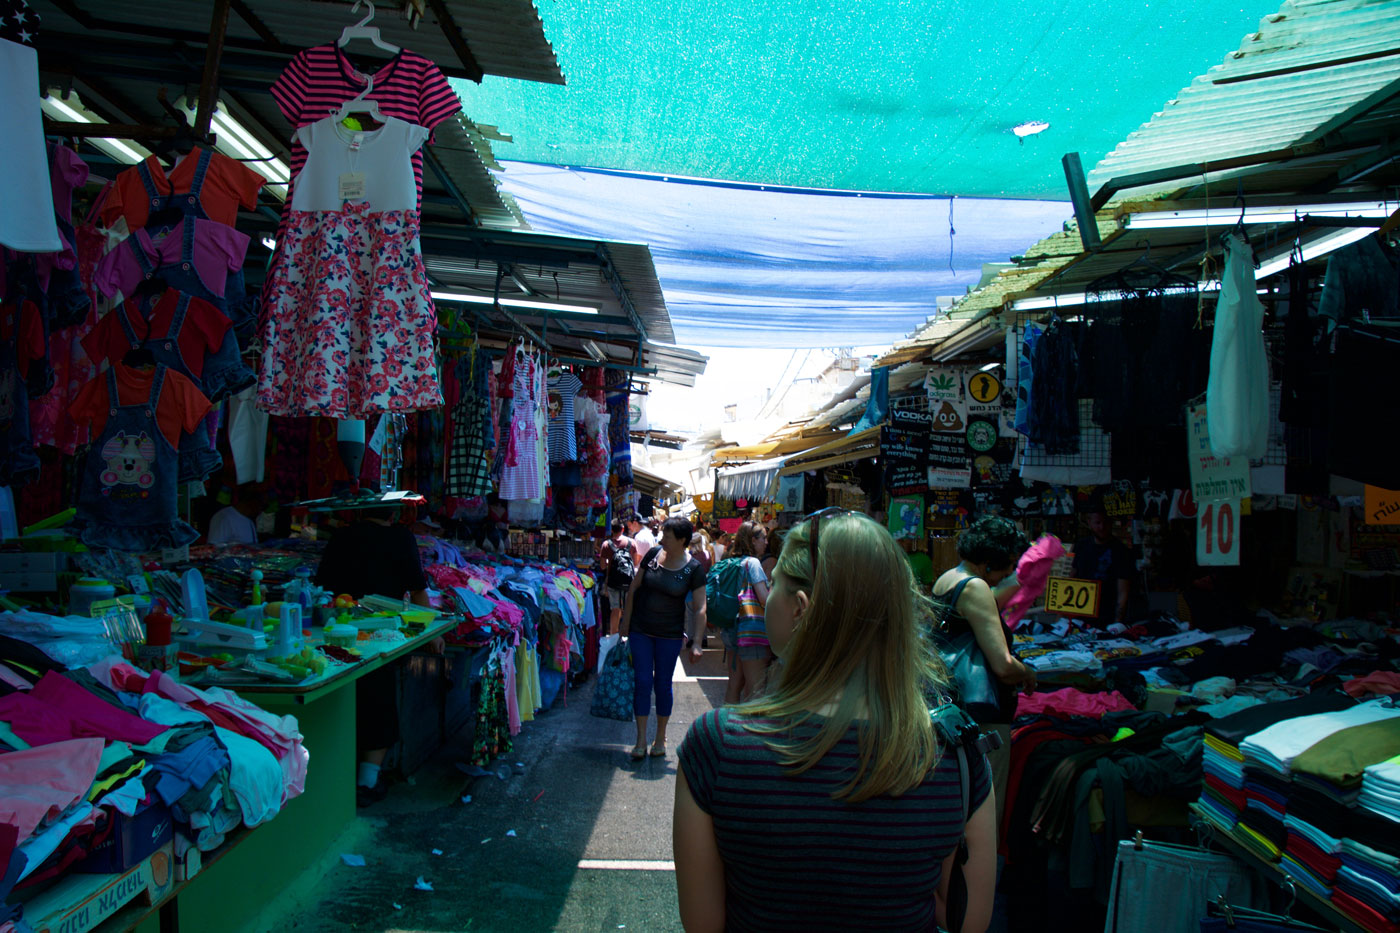 Tel Aviv's Carmel Market